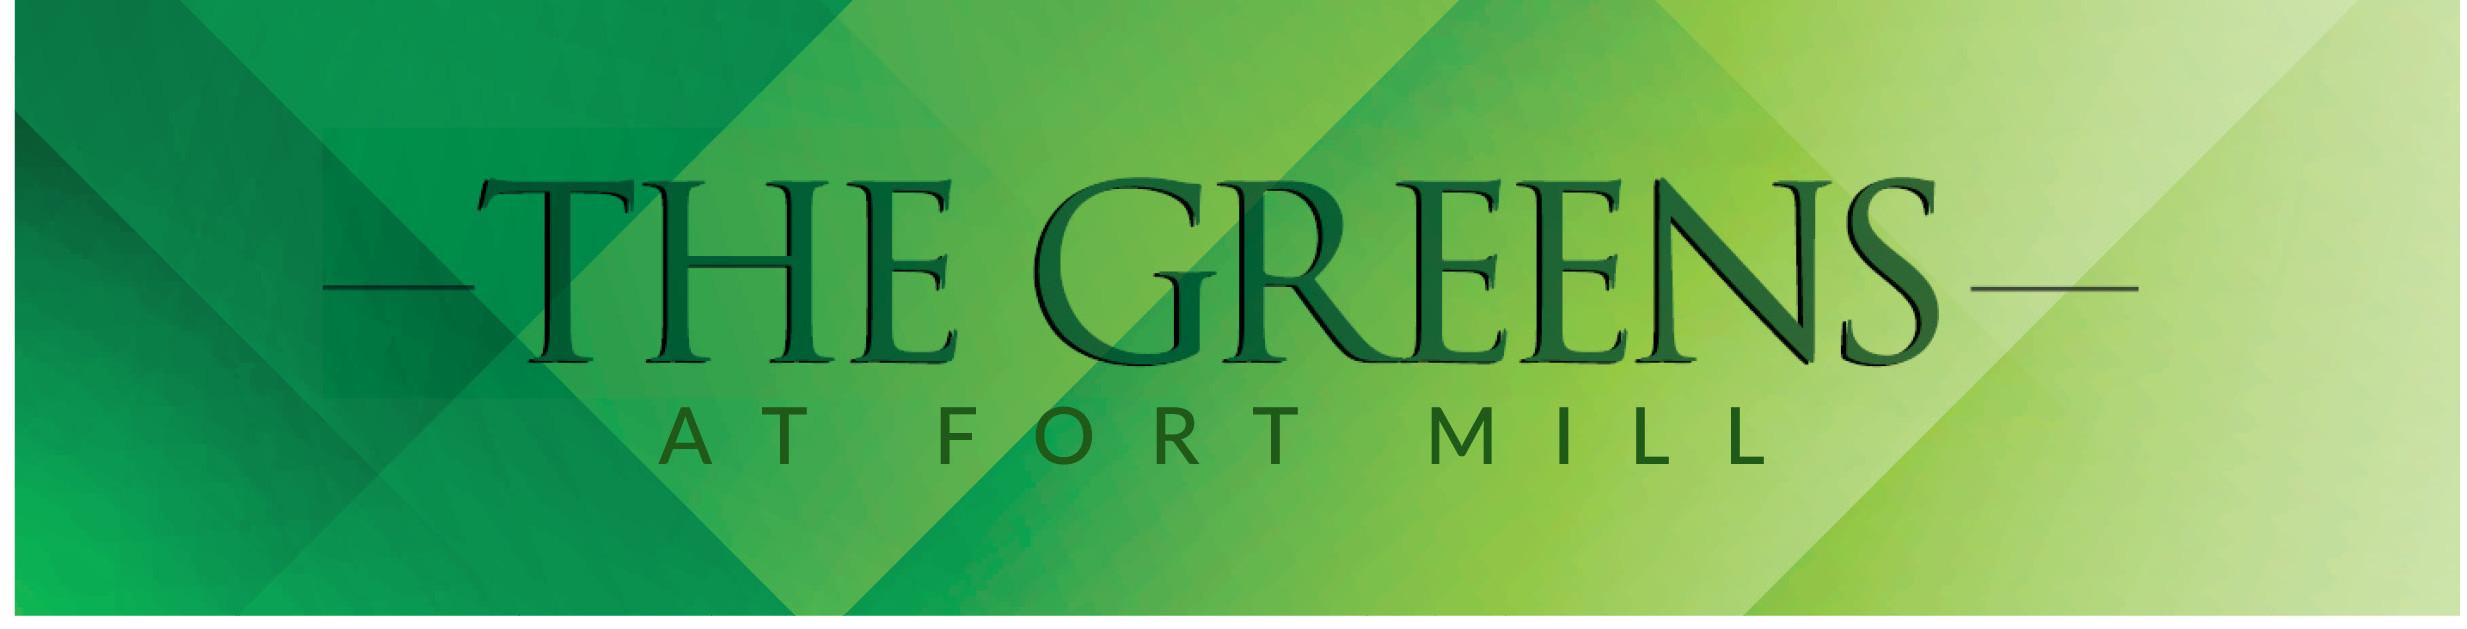 Greens @ Fort Mill